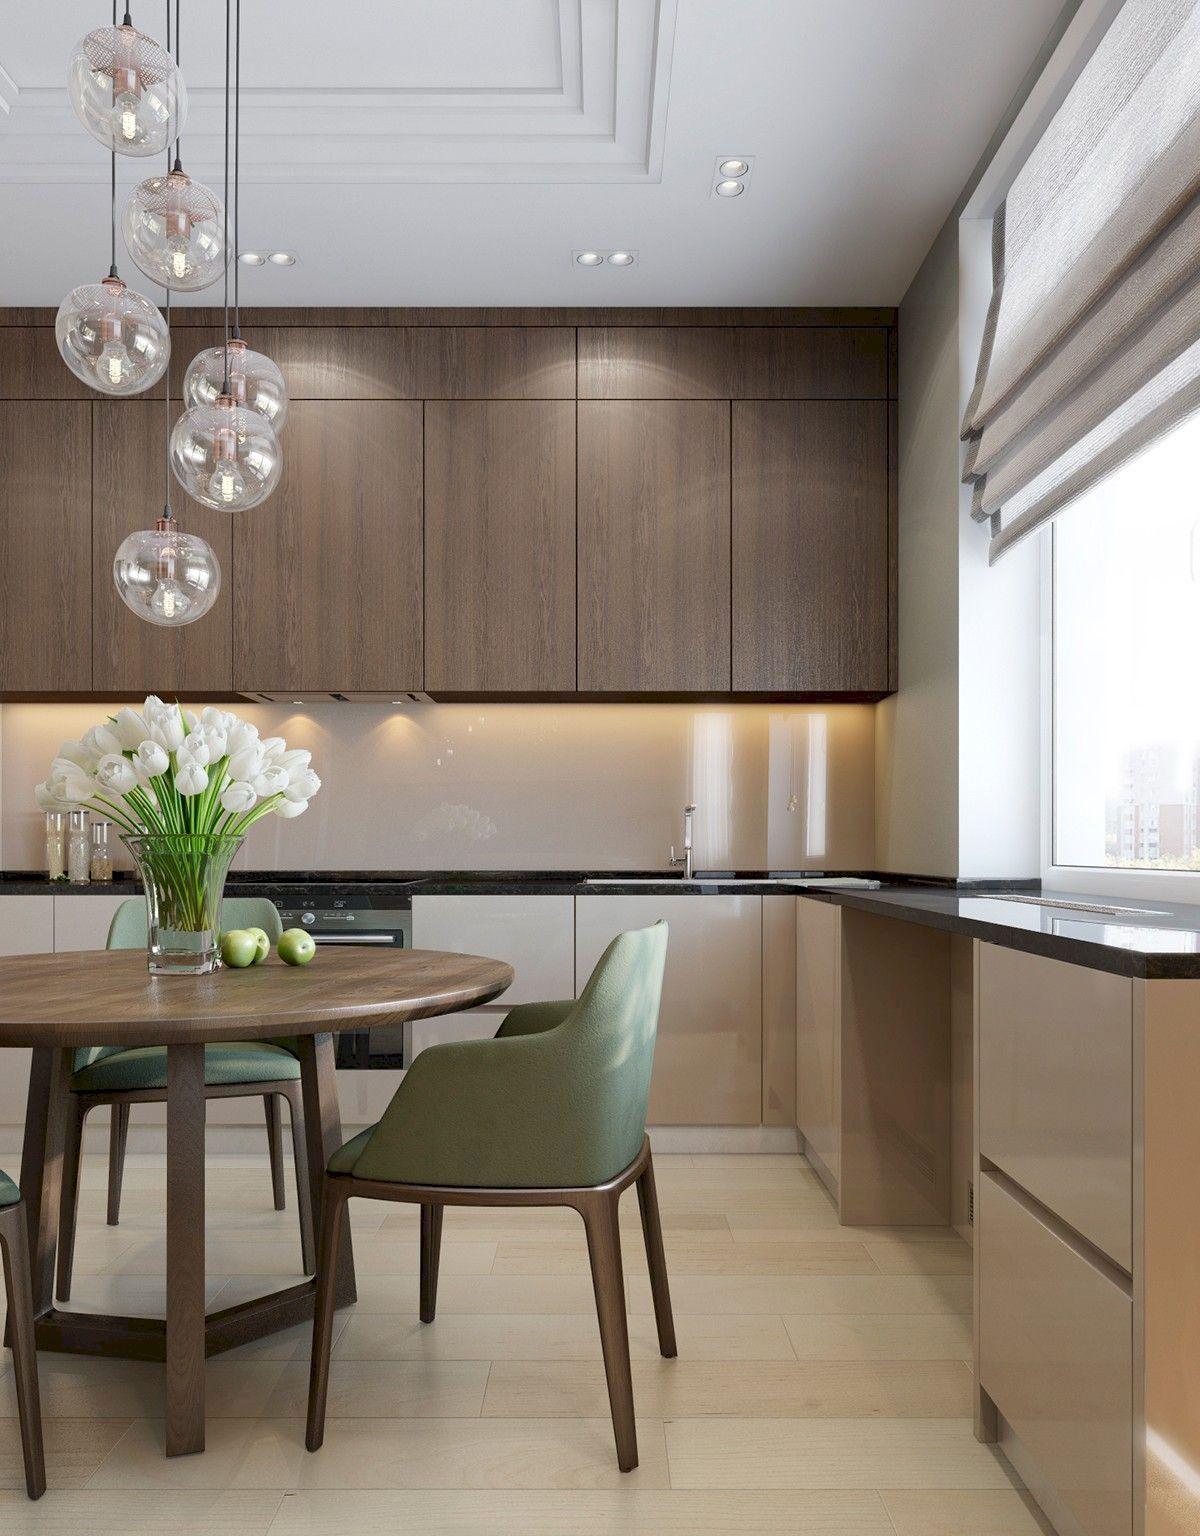 30 minimalist but luxurious kitchen design 36 in 2020 apartment interior luxury kitchens on kitchen interior luxury id=65493